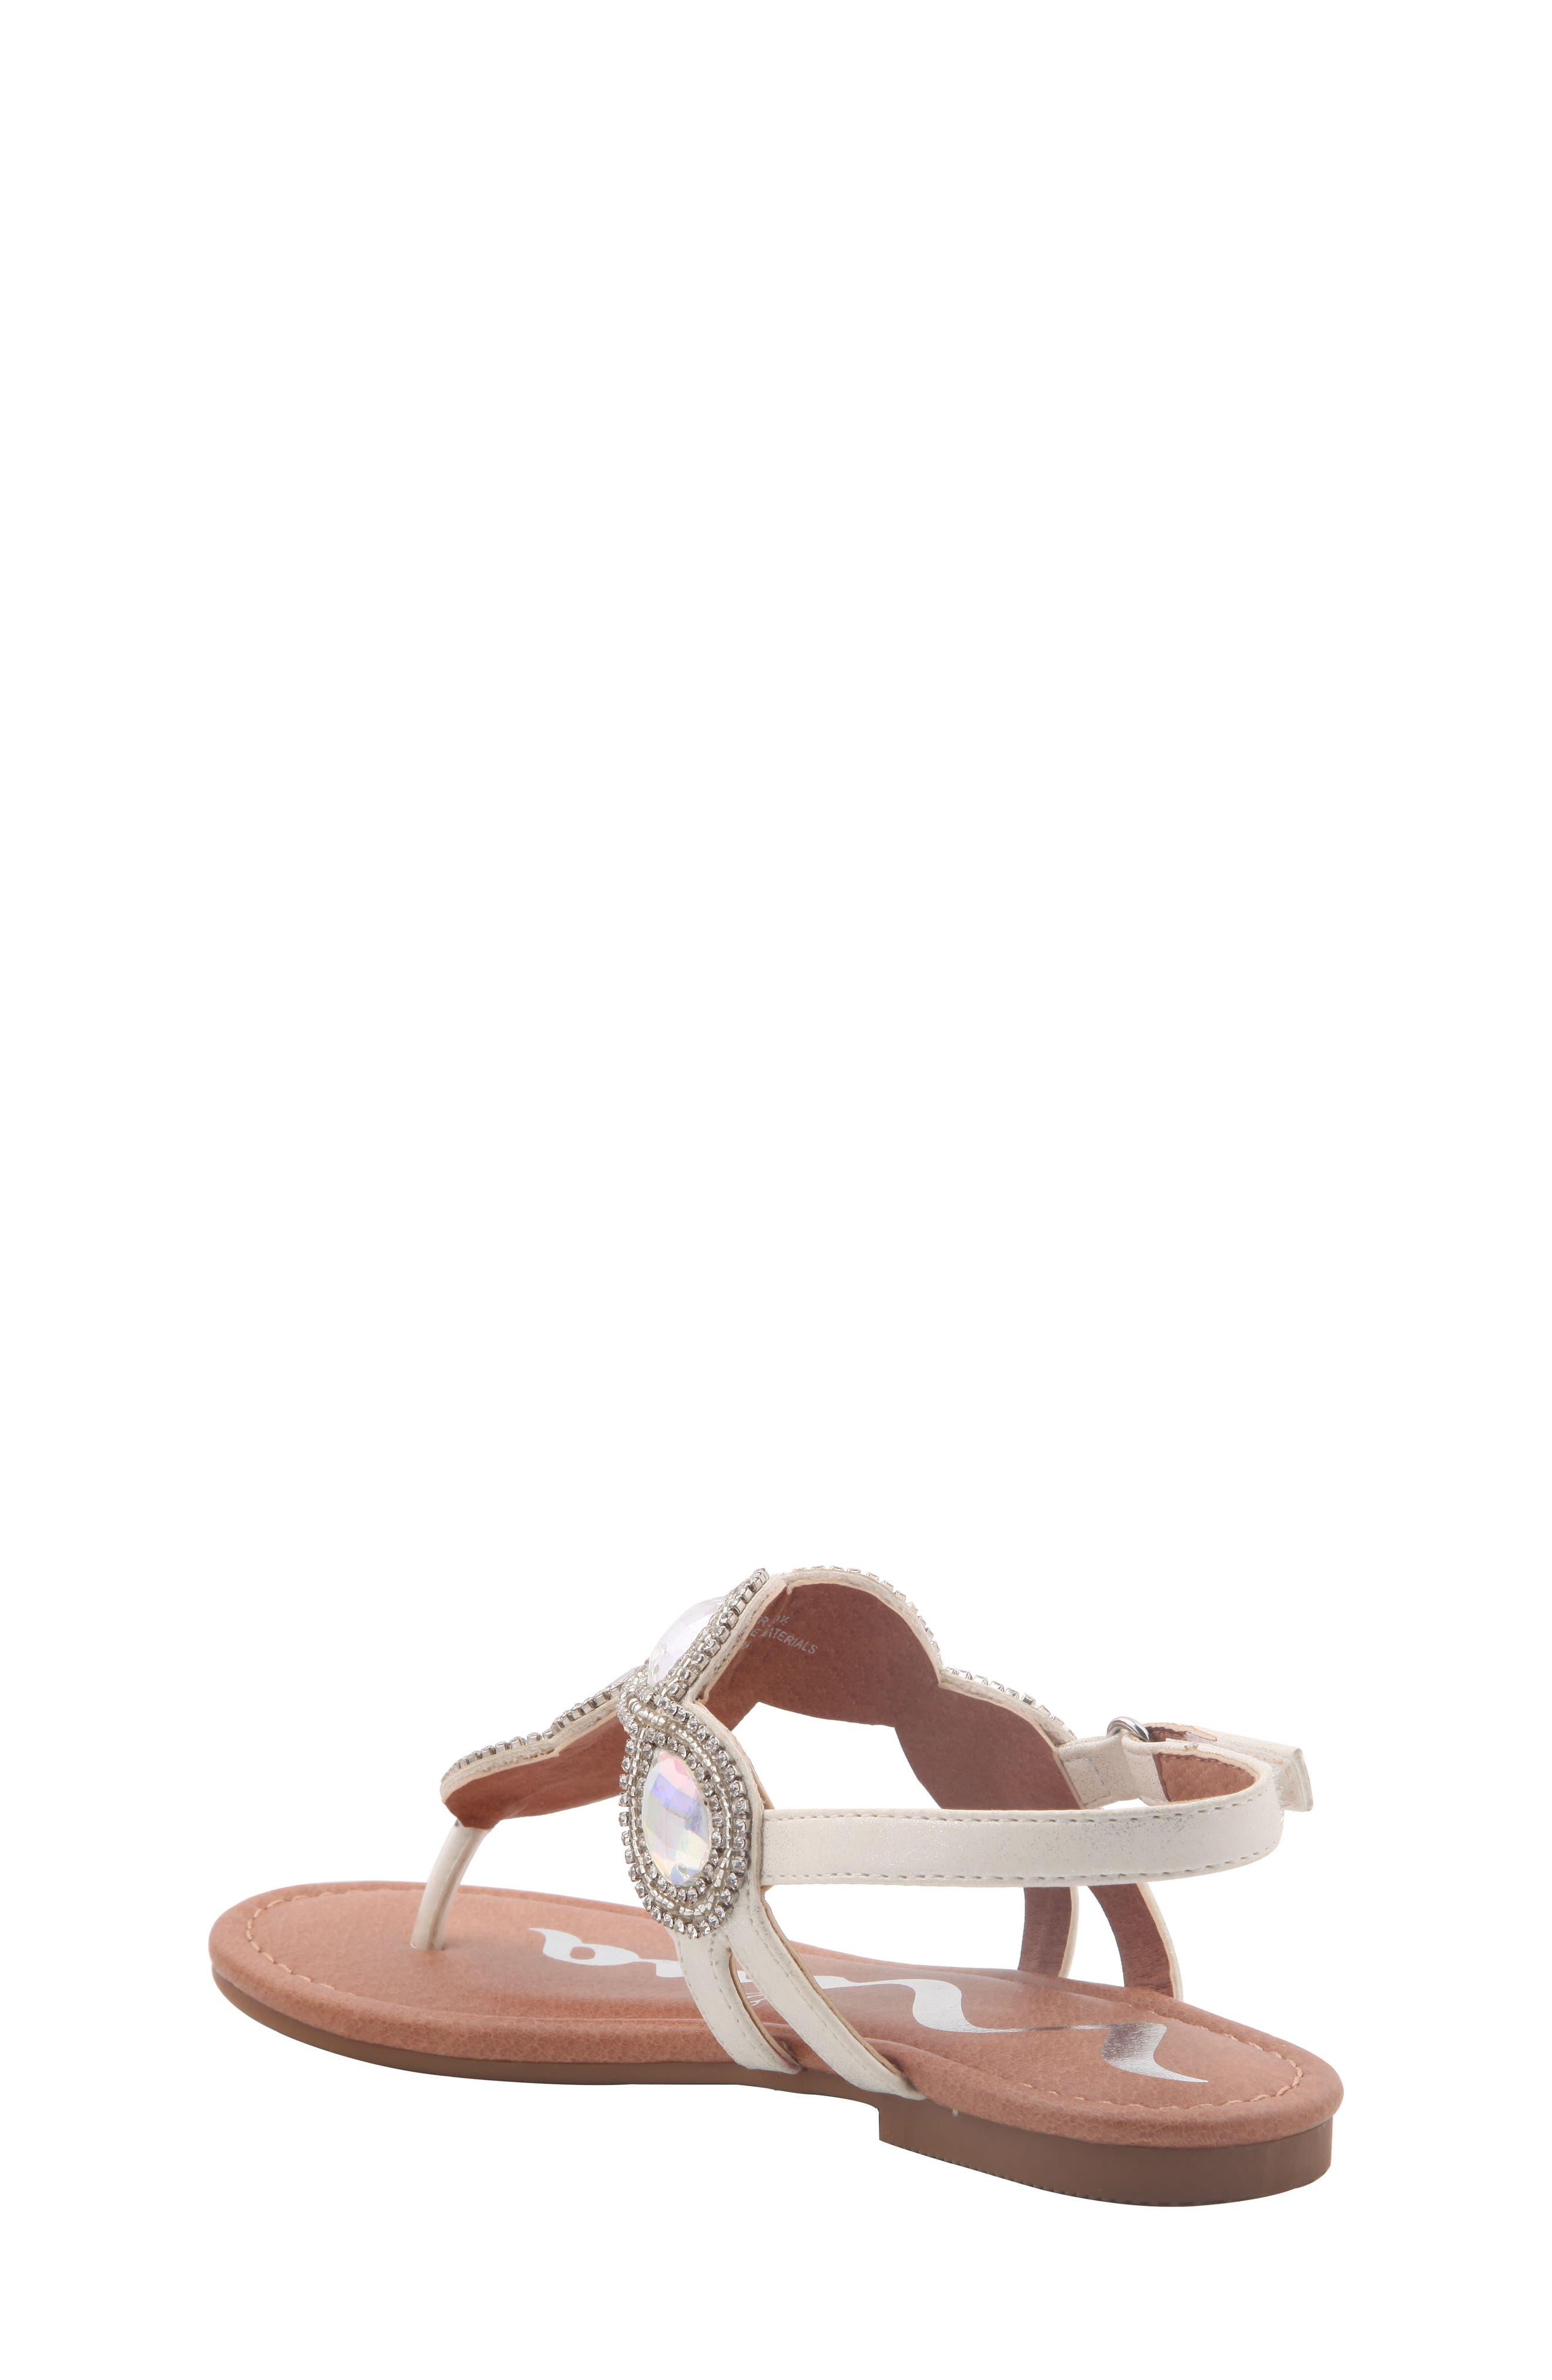 Elicia Embellished T-Strap Sandal,                             Alternate thumbnail 2, color,                             SILVER METALLIC